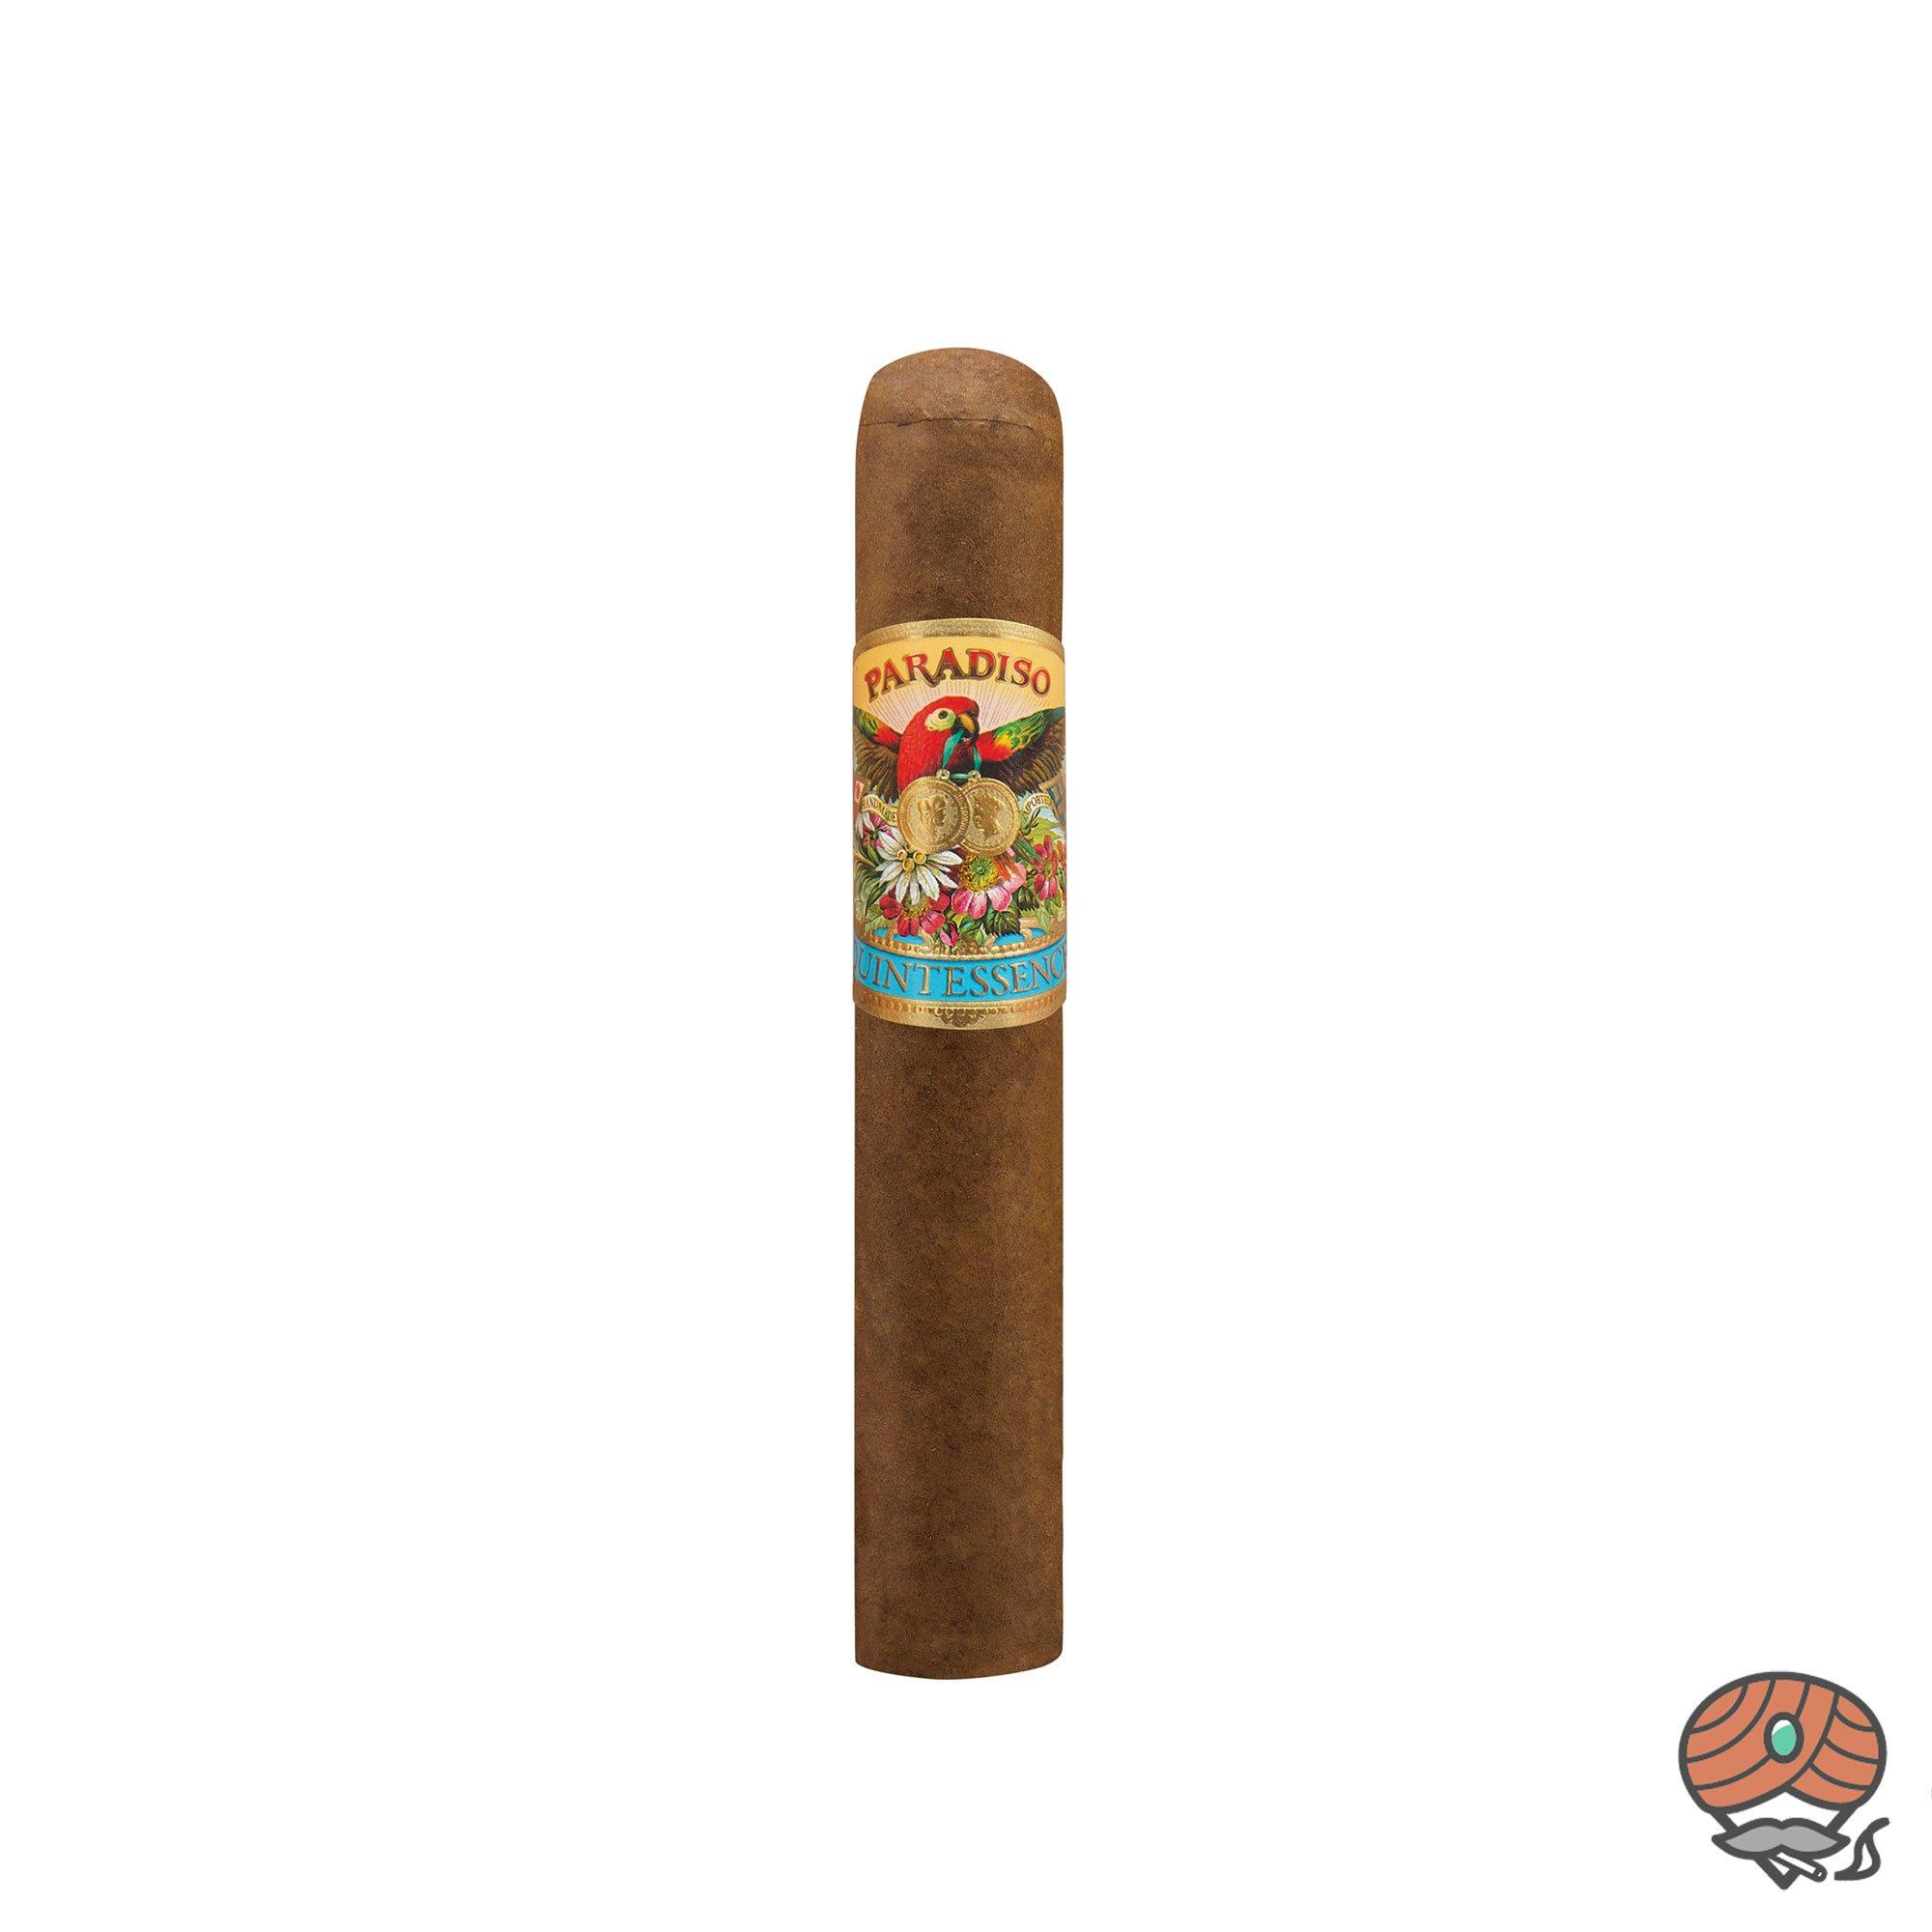 Paradiso Quintessence Majestic Zigarre aus Nicaragua